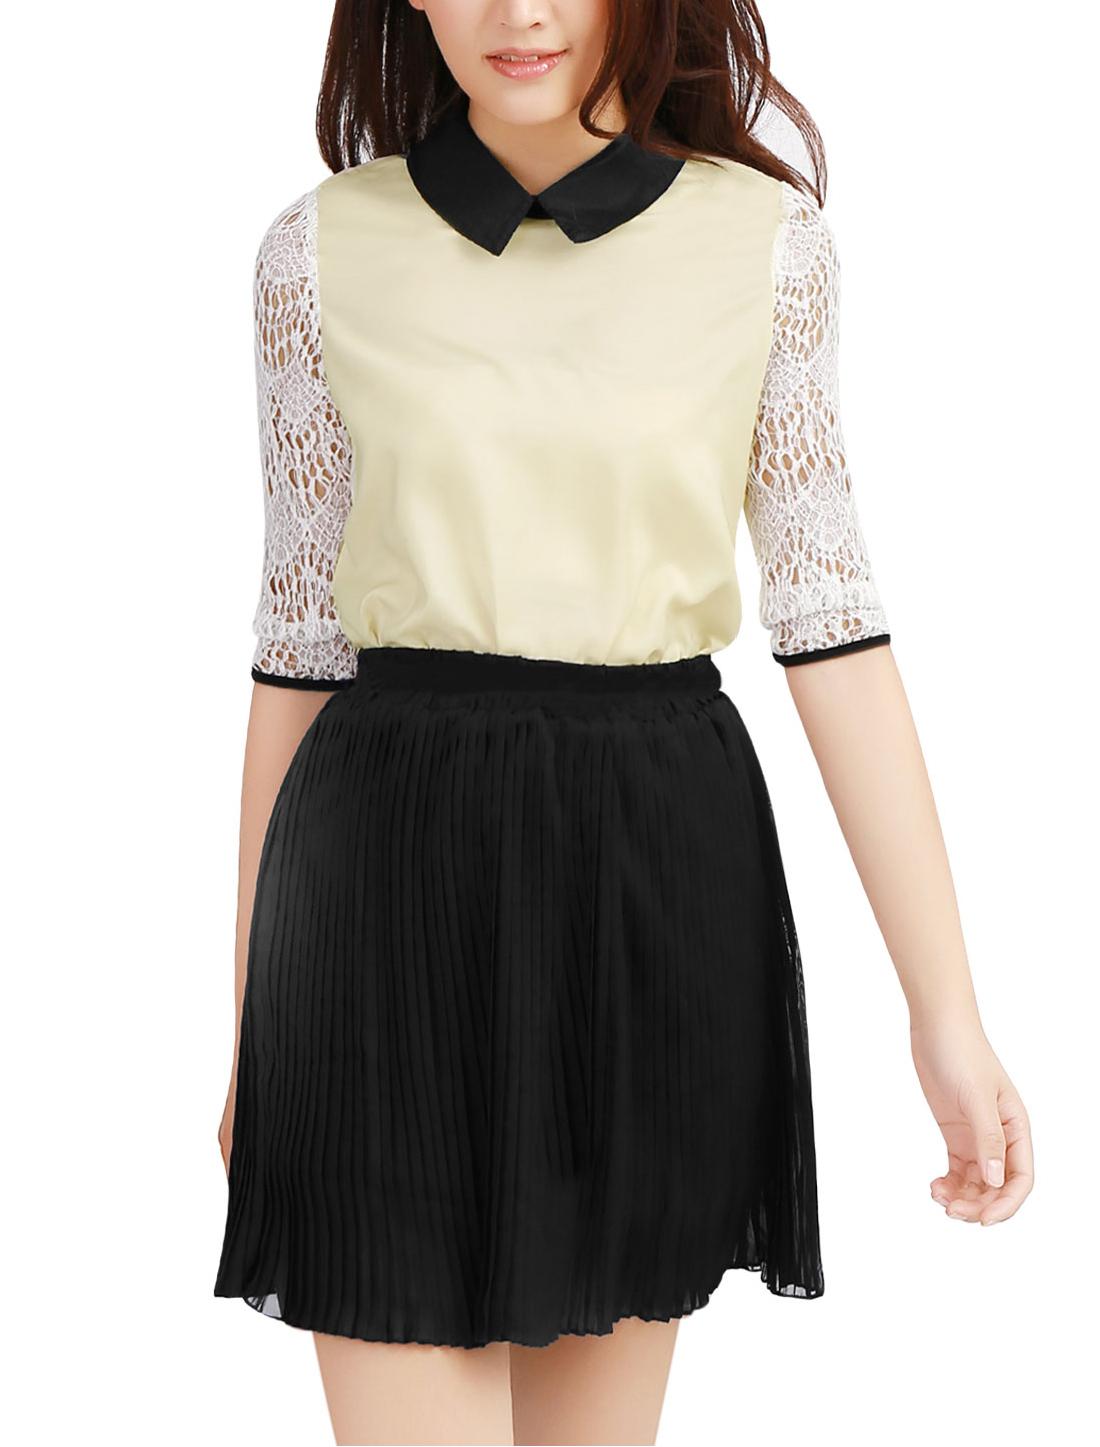 Woman 3/4 Crochet Sleeve Point Collar Semi Sheer Blouse Beige S